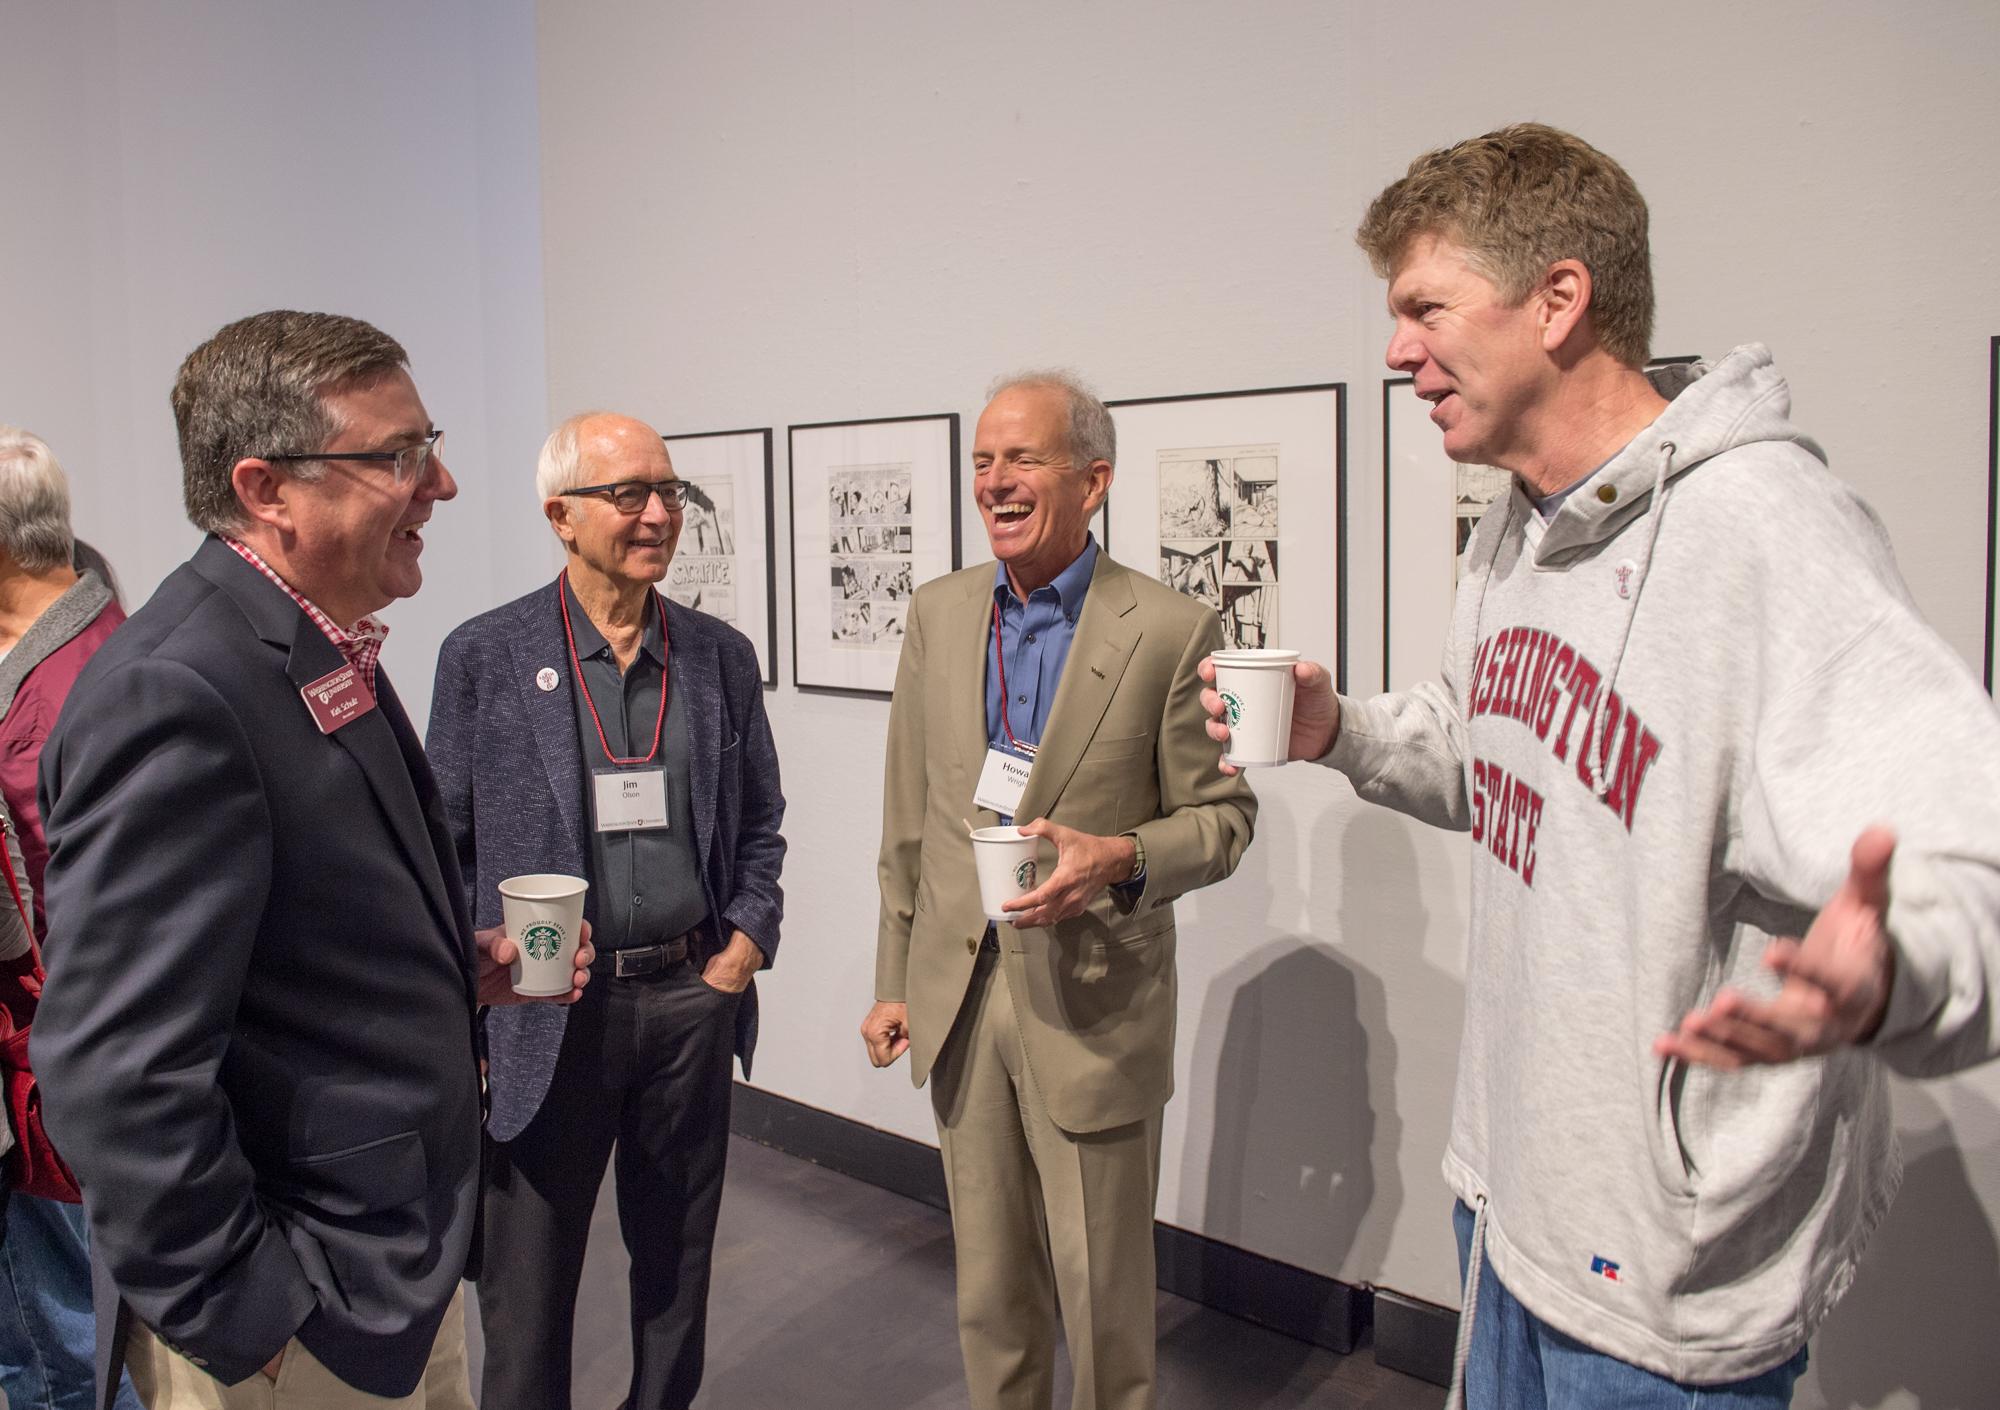 WSU President, Kirk Schulz; Jim Olson, Olson/Kundig; H.S. Wright, III; Mikal Thomsen